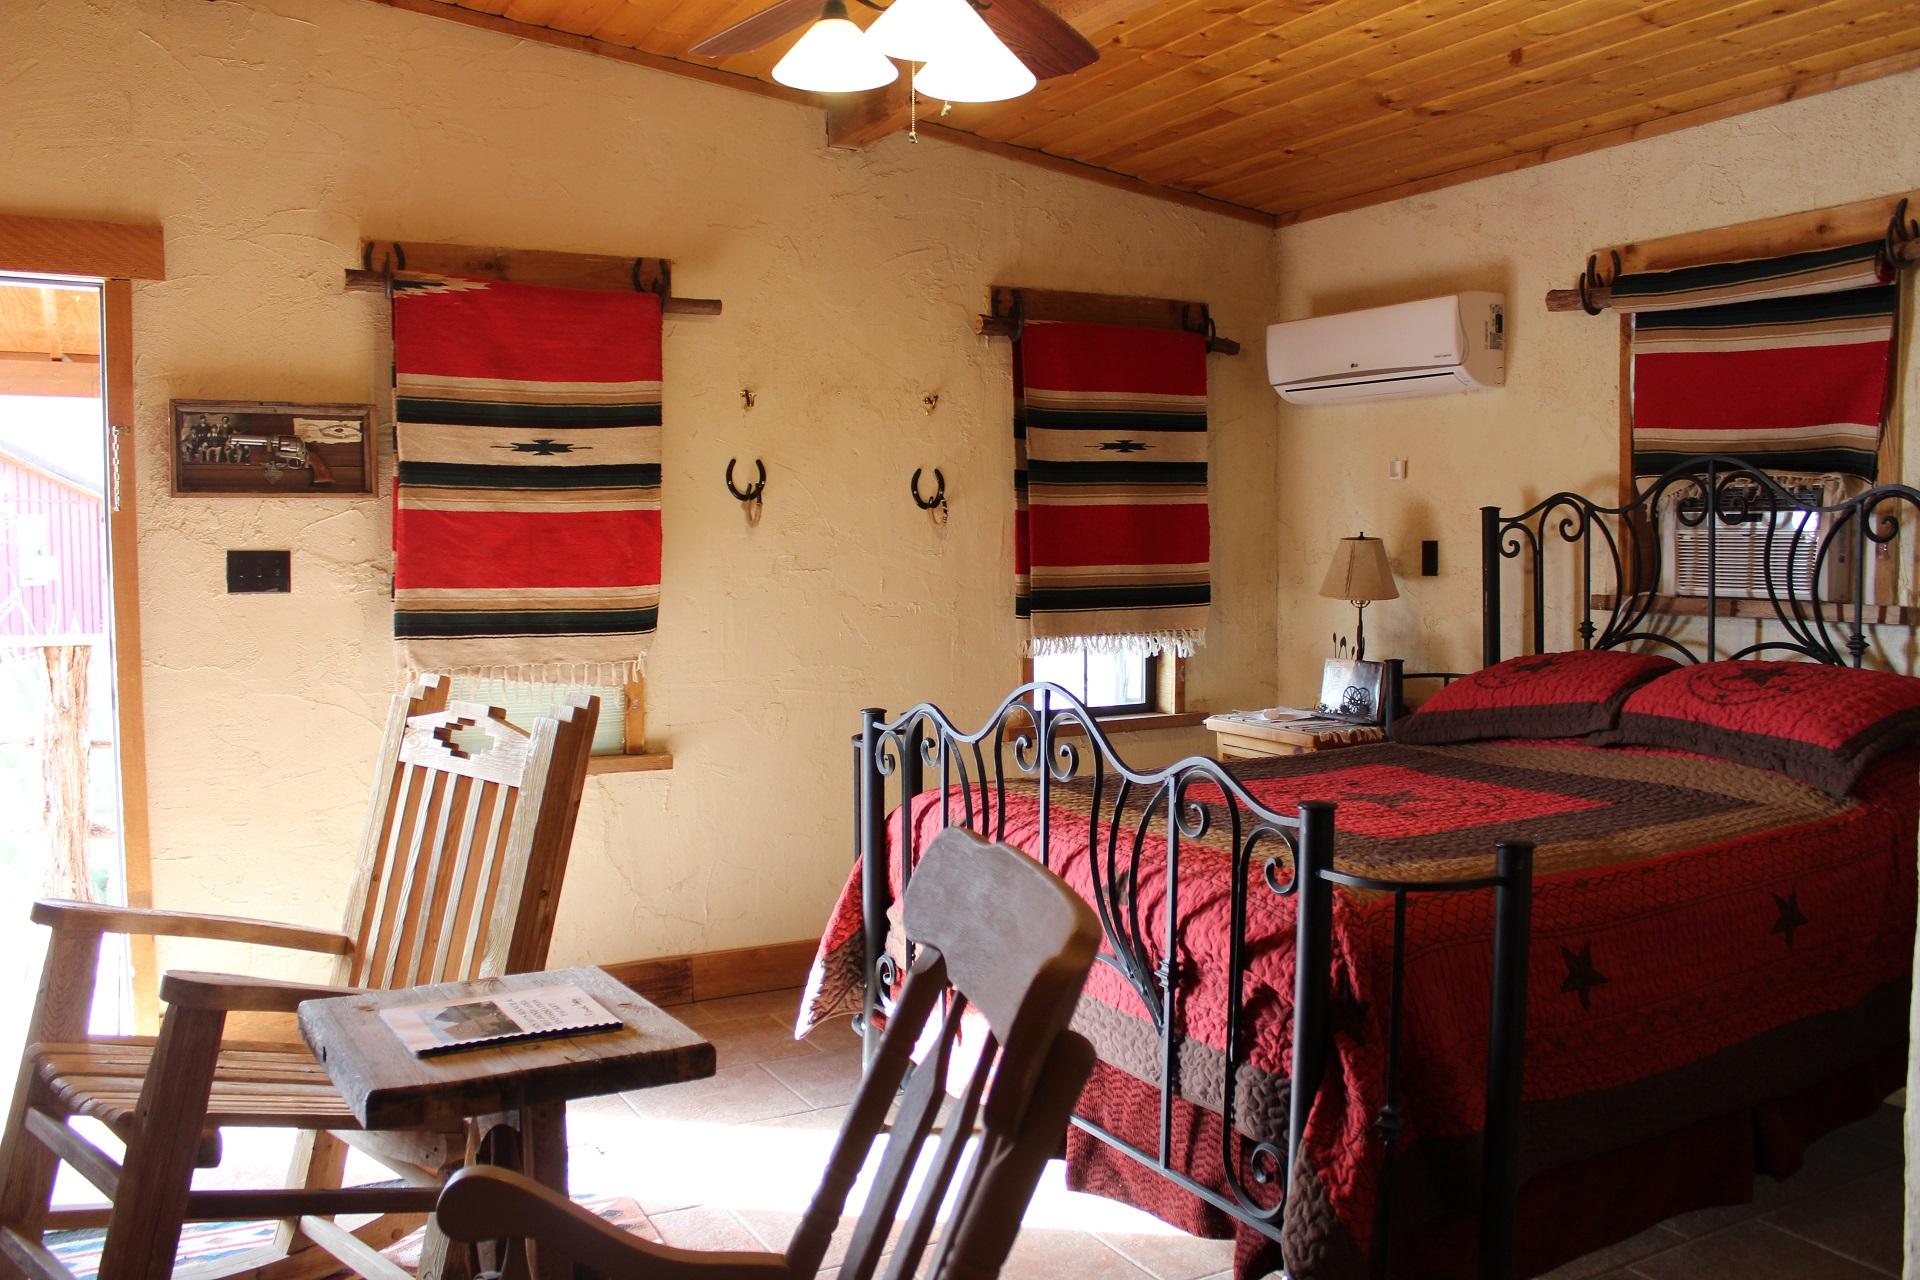 Big Bend National Park Lodging - Ten Bits Ranch | Cowboy Inn